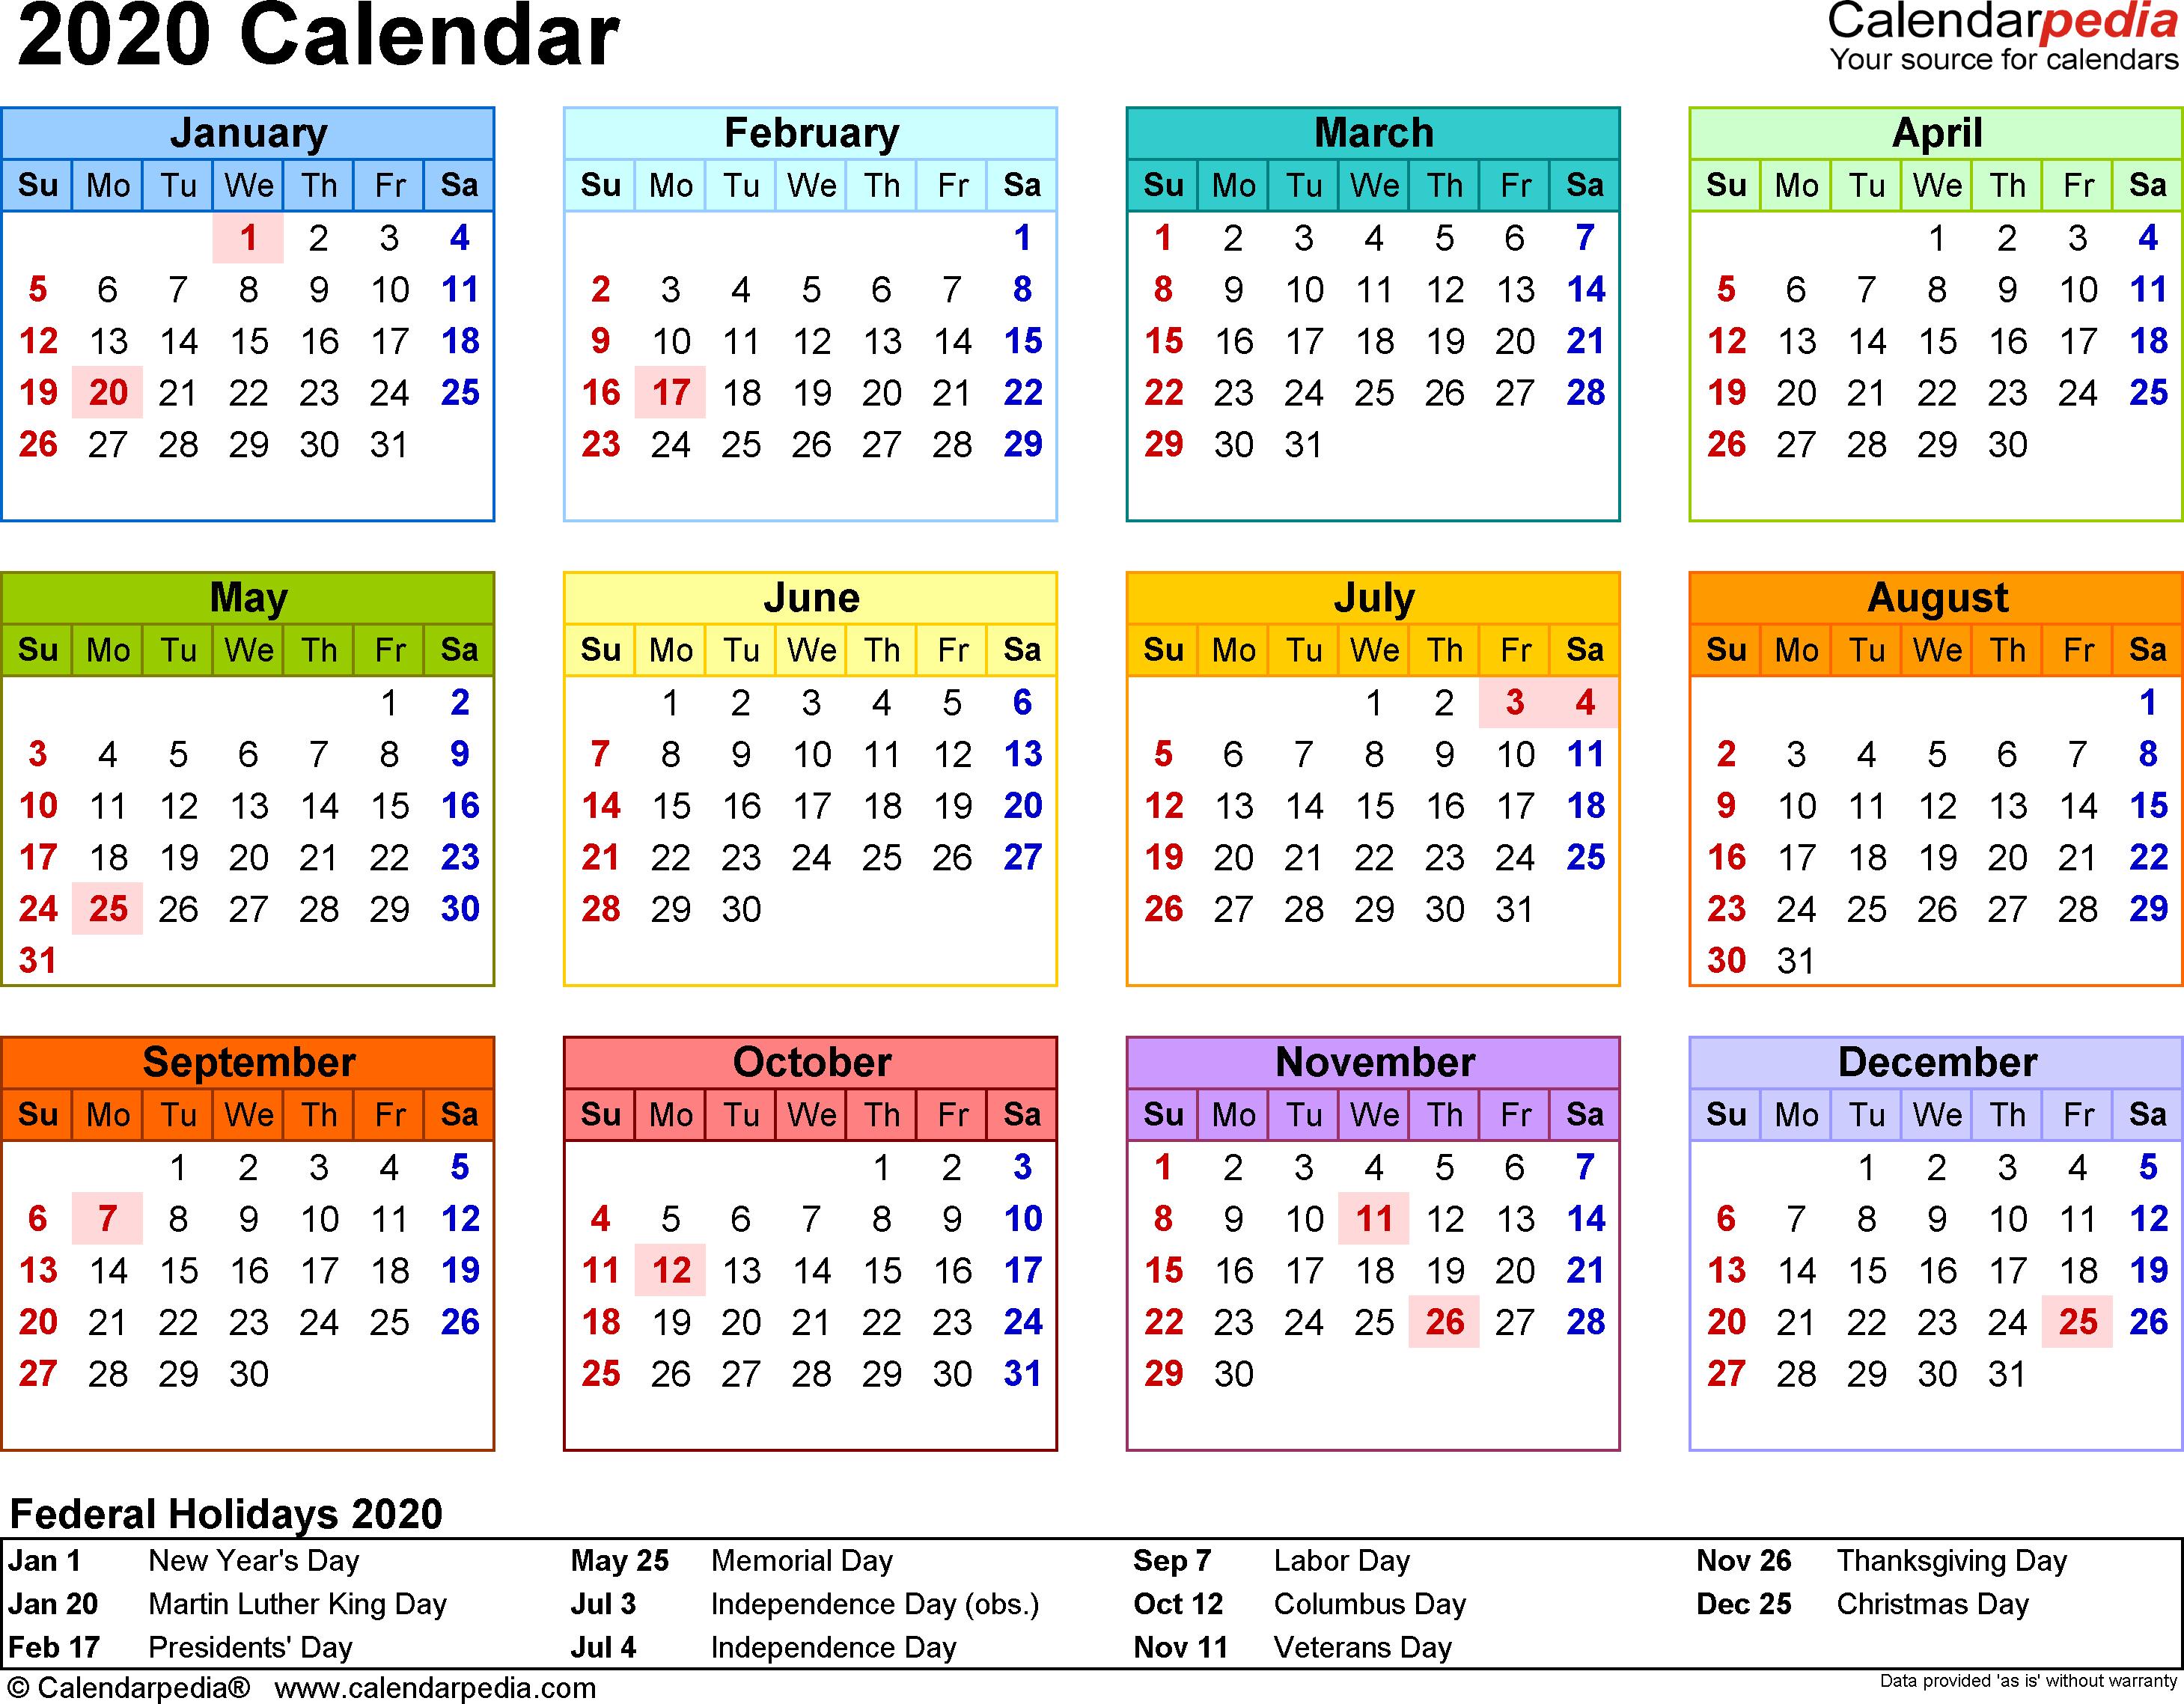 2020 Calendar Pdf - 17 Free Printable Calendar Templates throughout Large Print 2020 Calendar To Print Free